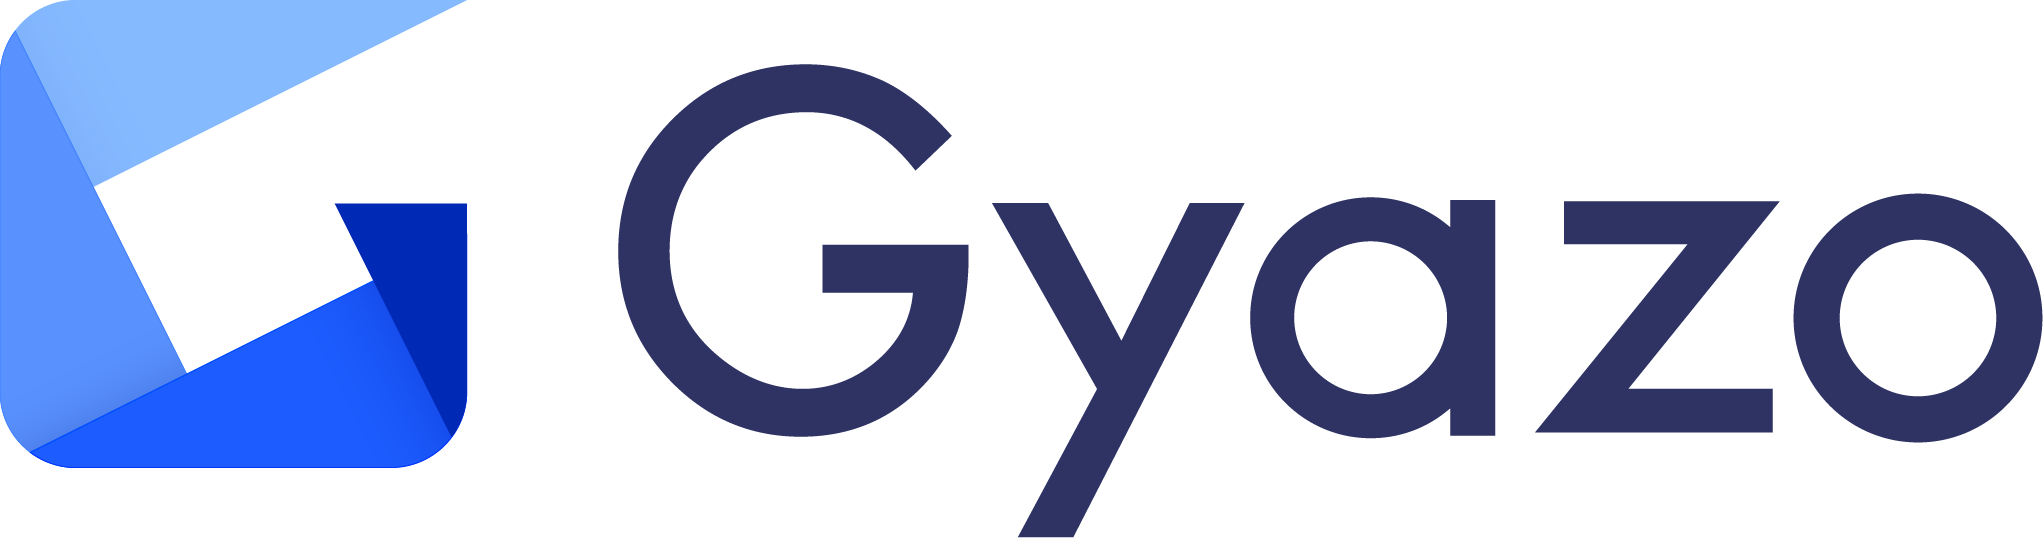 How do I use Gyazo GIF? – Gyazo Support